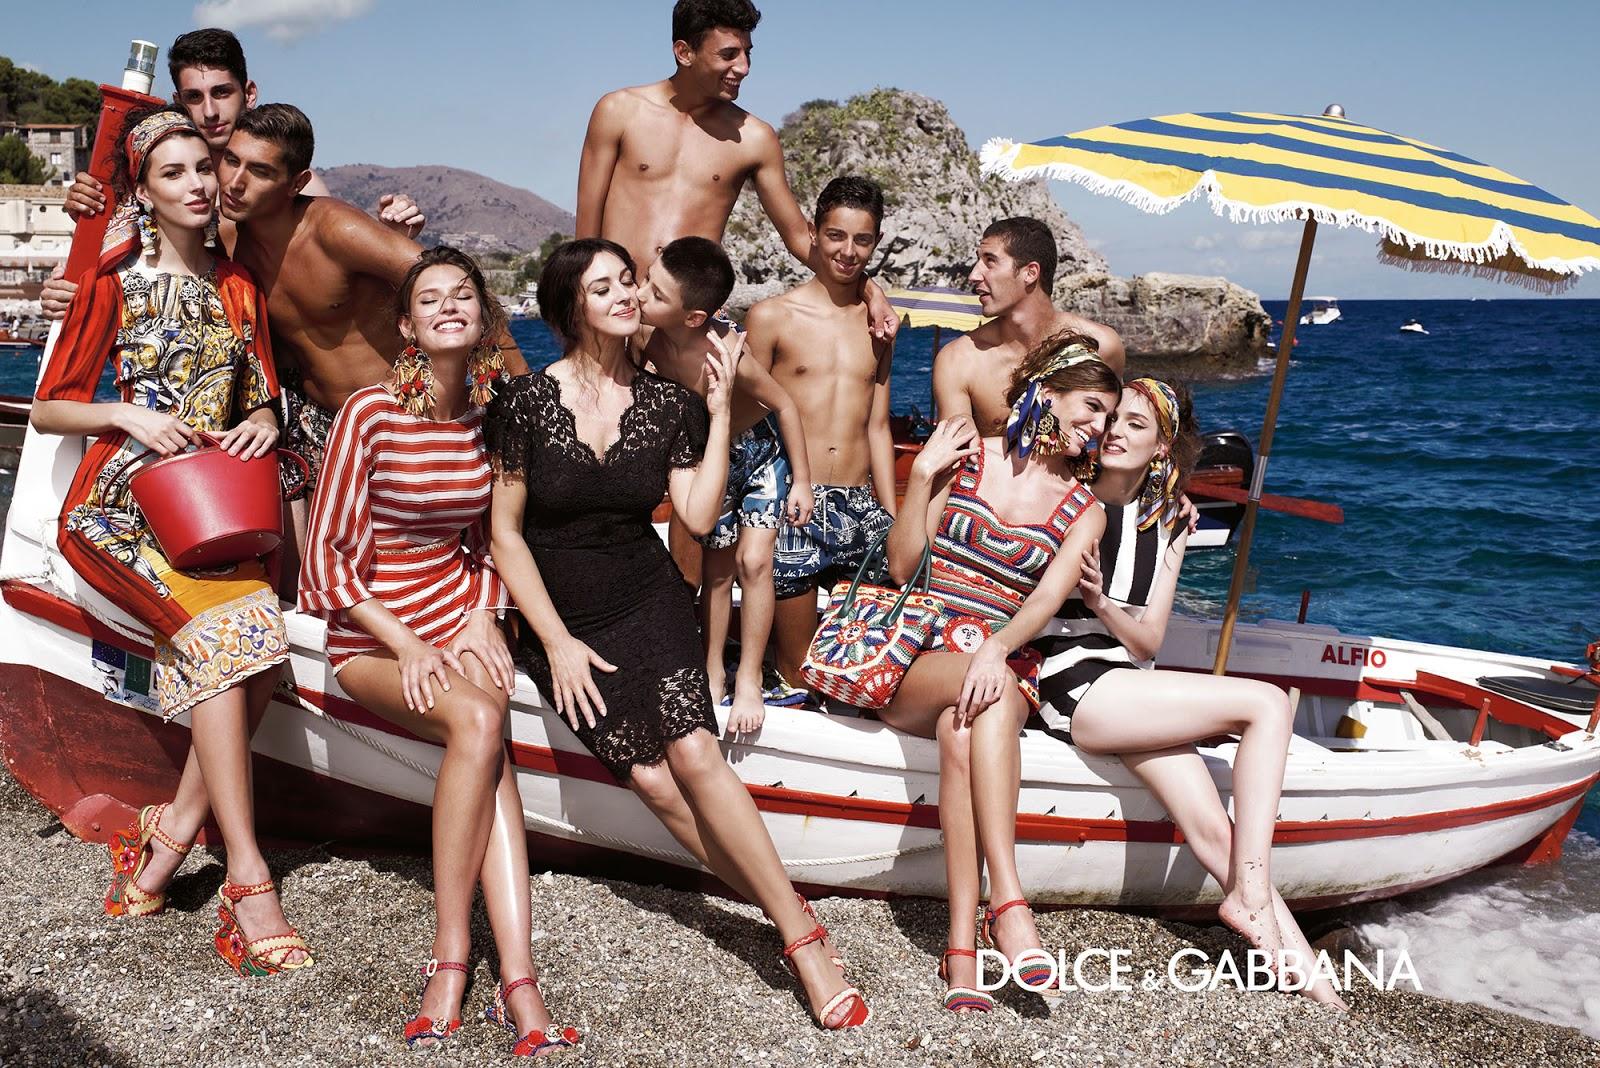 dolce-gabbana-adv-campaign-ss-2013-women-03